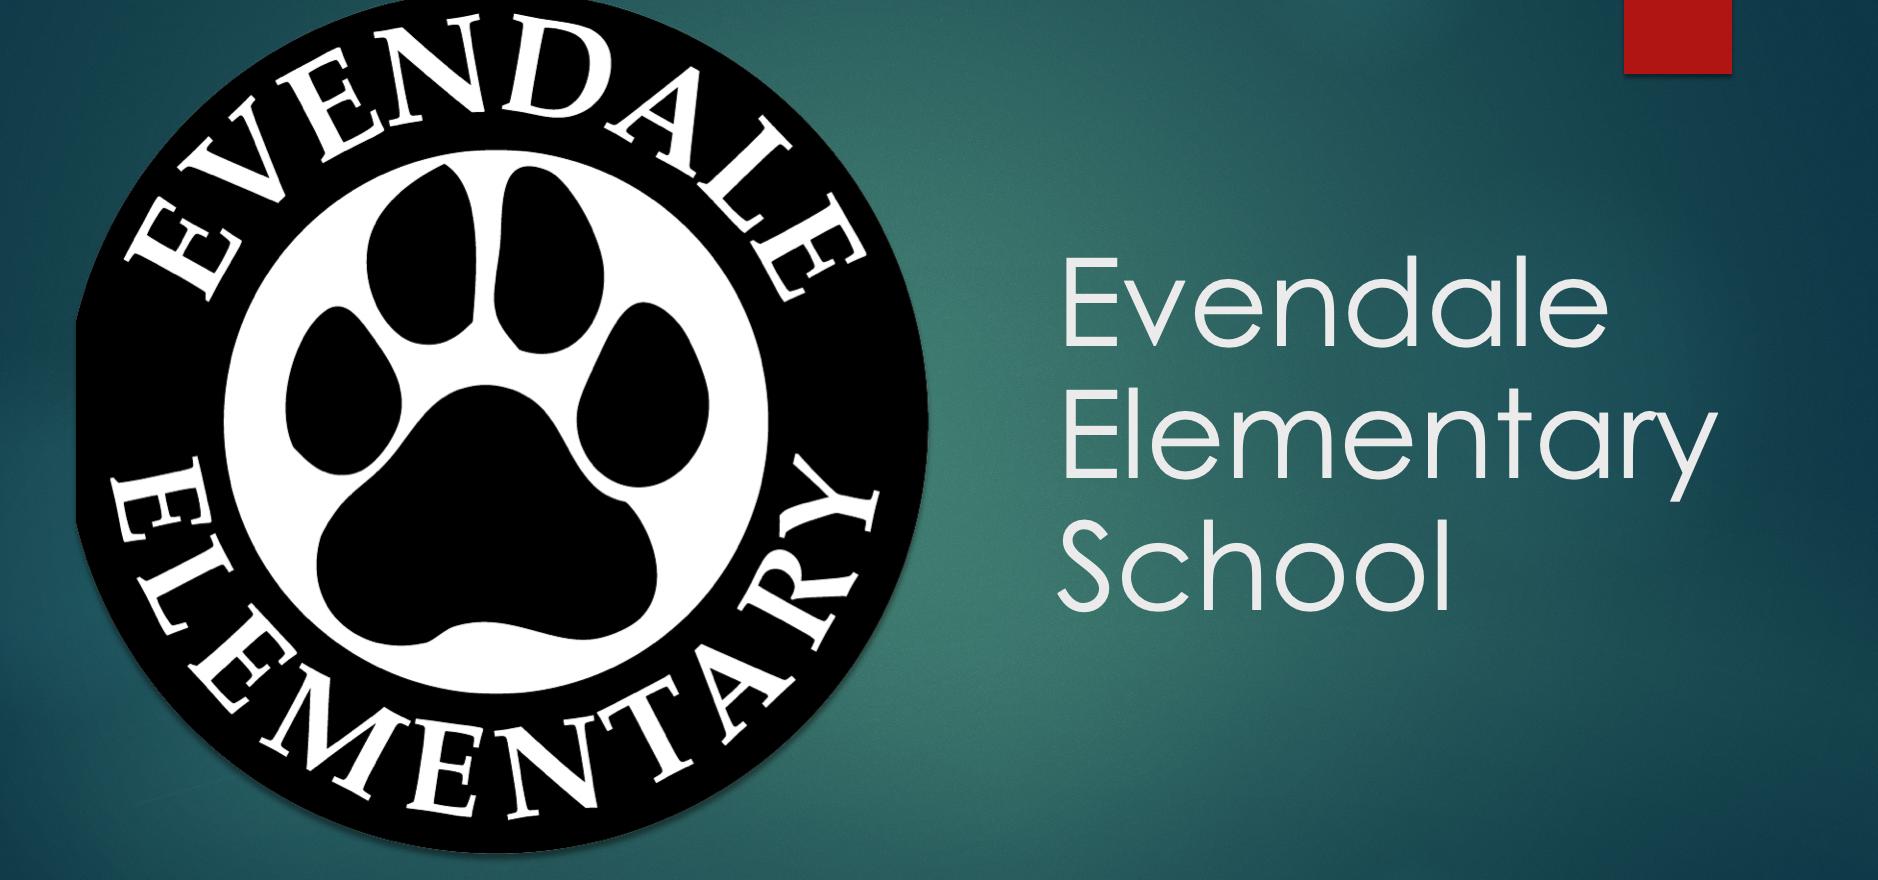 EVENDALE ELEMENTARY